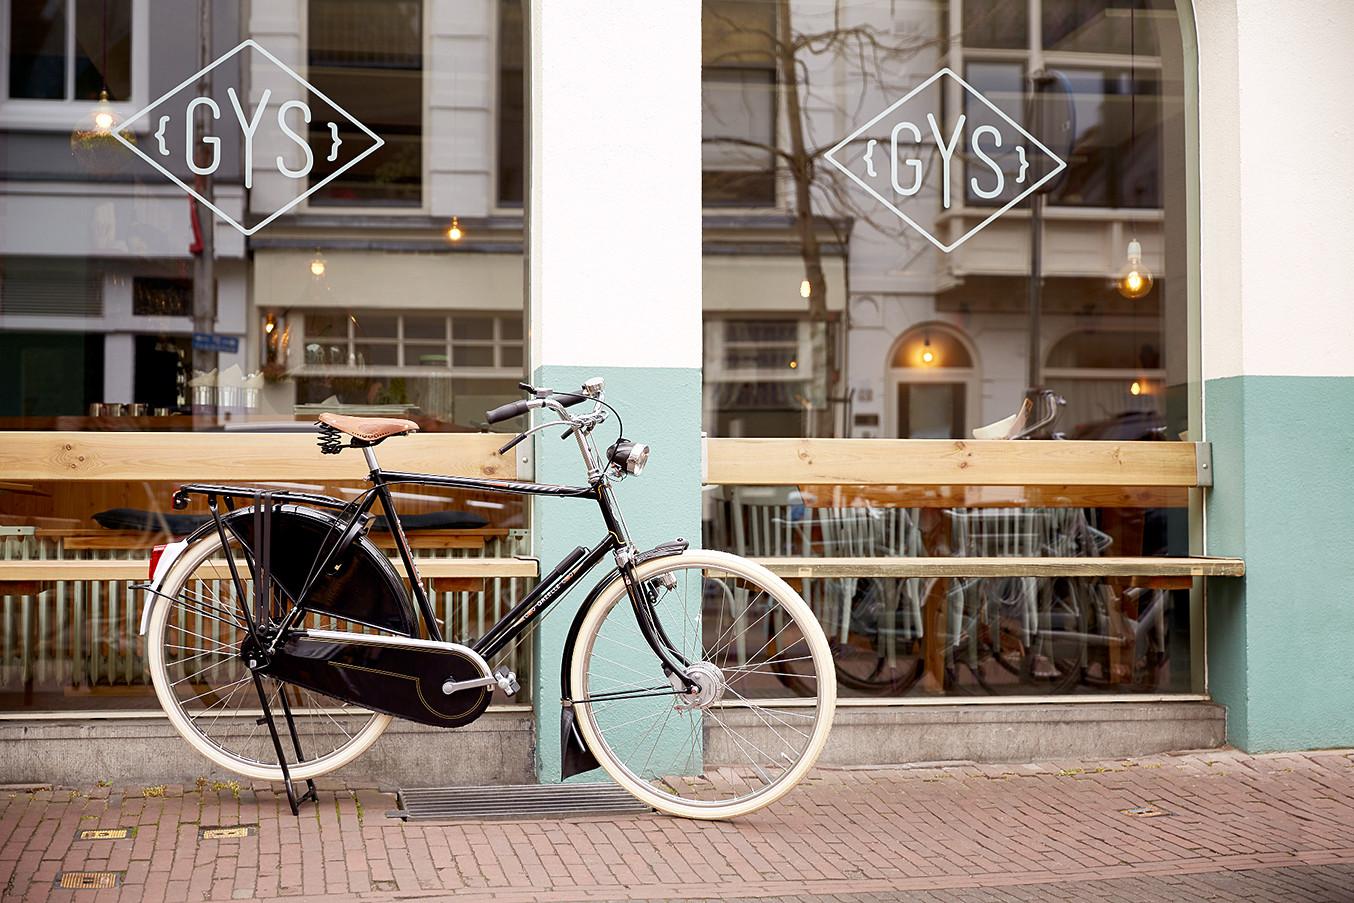 Mythos Hollanrad Gazelle Tour Populair - Hollandrad kaufen - Test - Information Lucky Bike